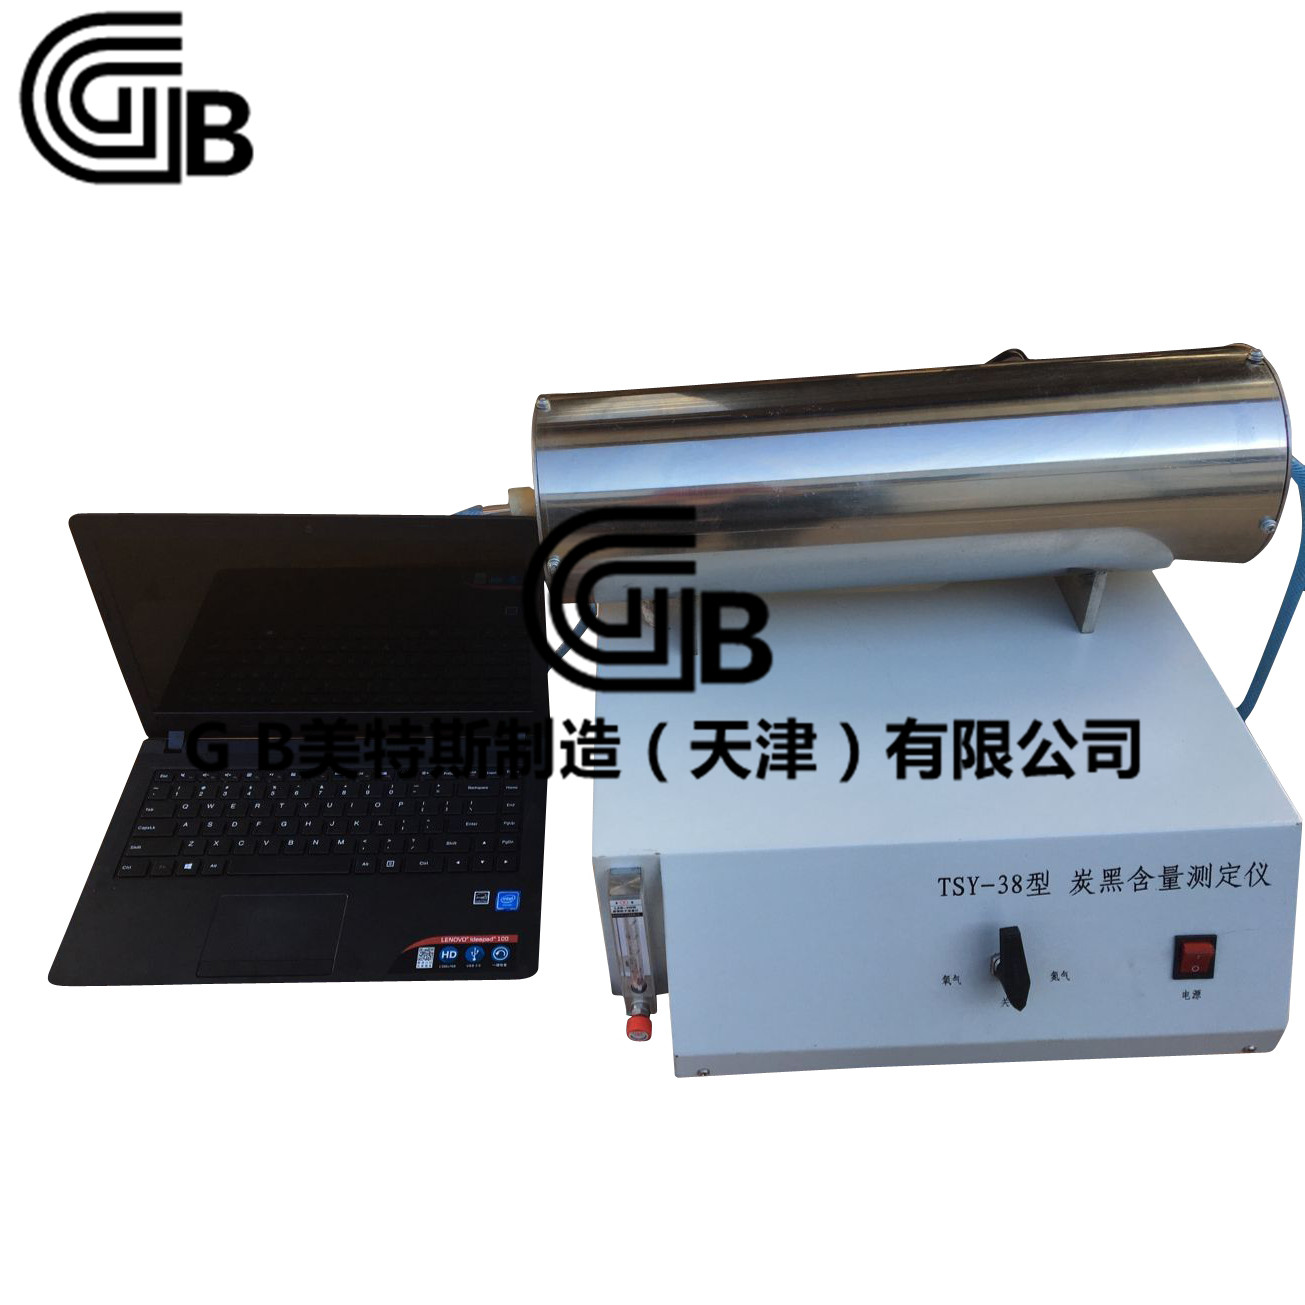 GB土工合成材料炭黑含量(熱失重法)試驗記錄表免費下載